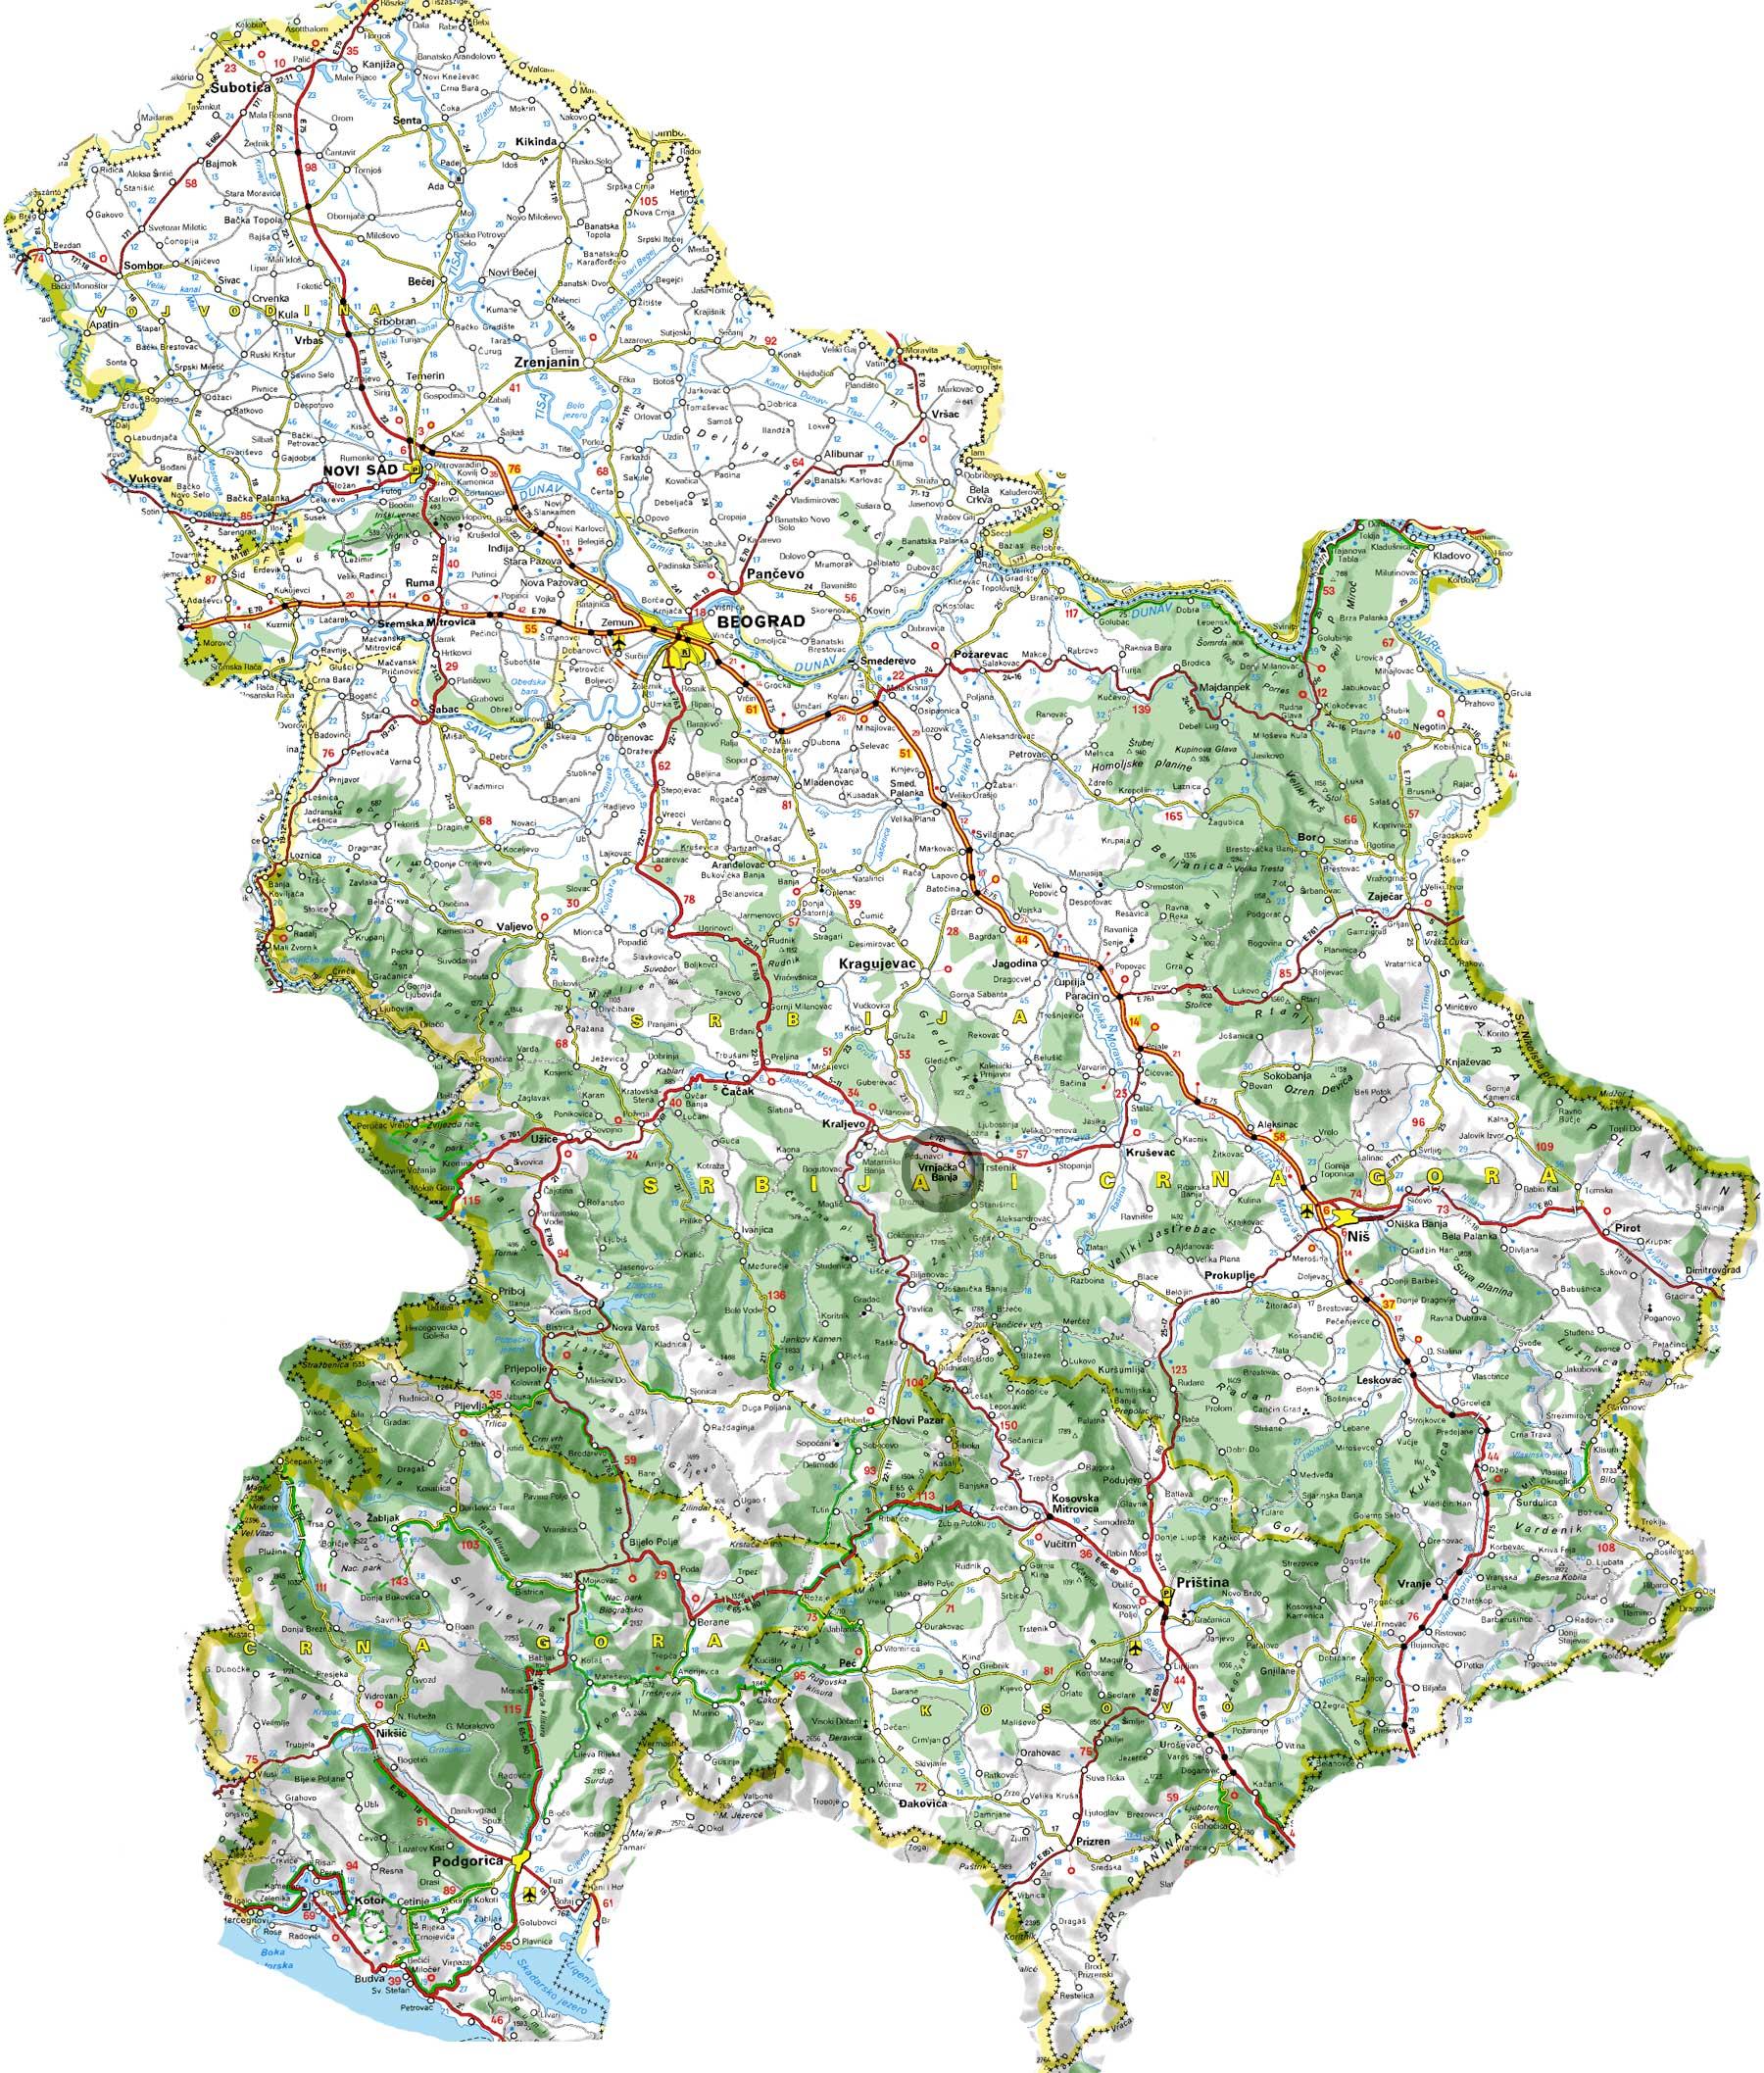 mapa planina srbije Geografski položaj | Turizam u Srbiji mapa planina srbije